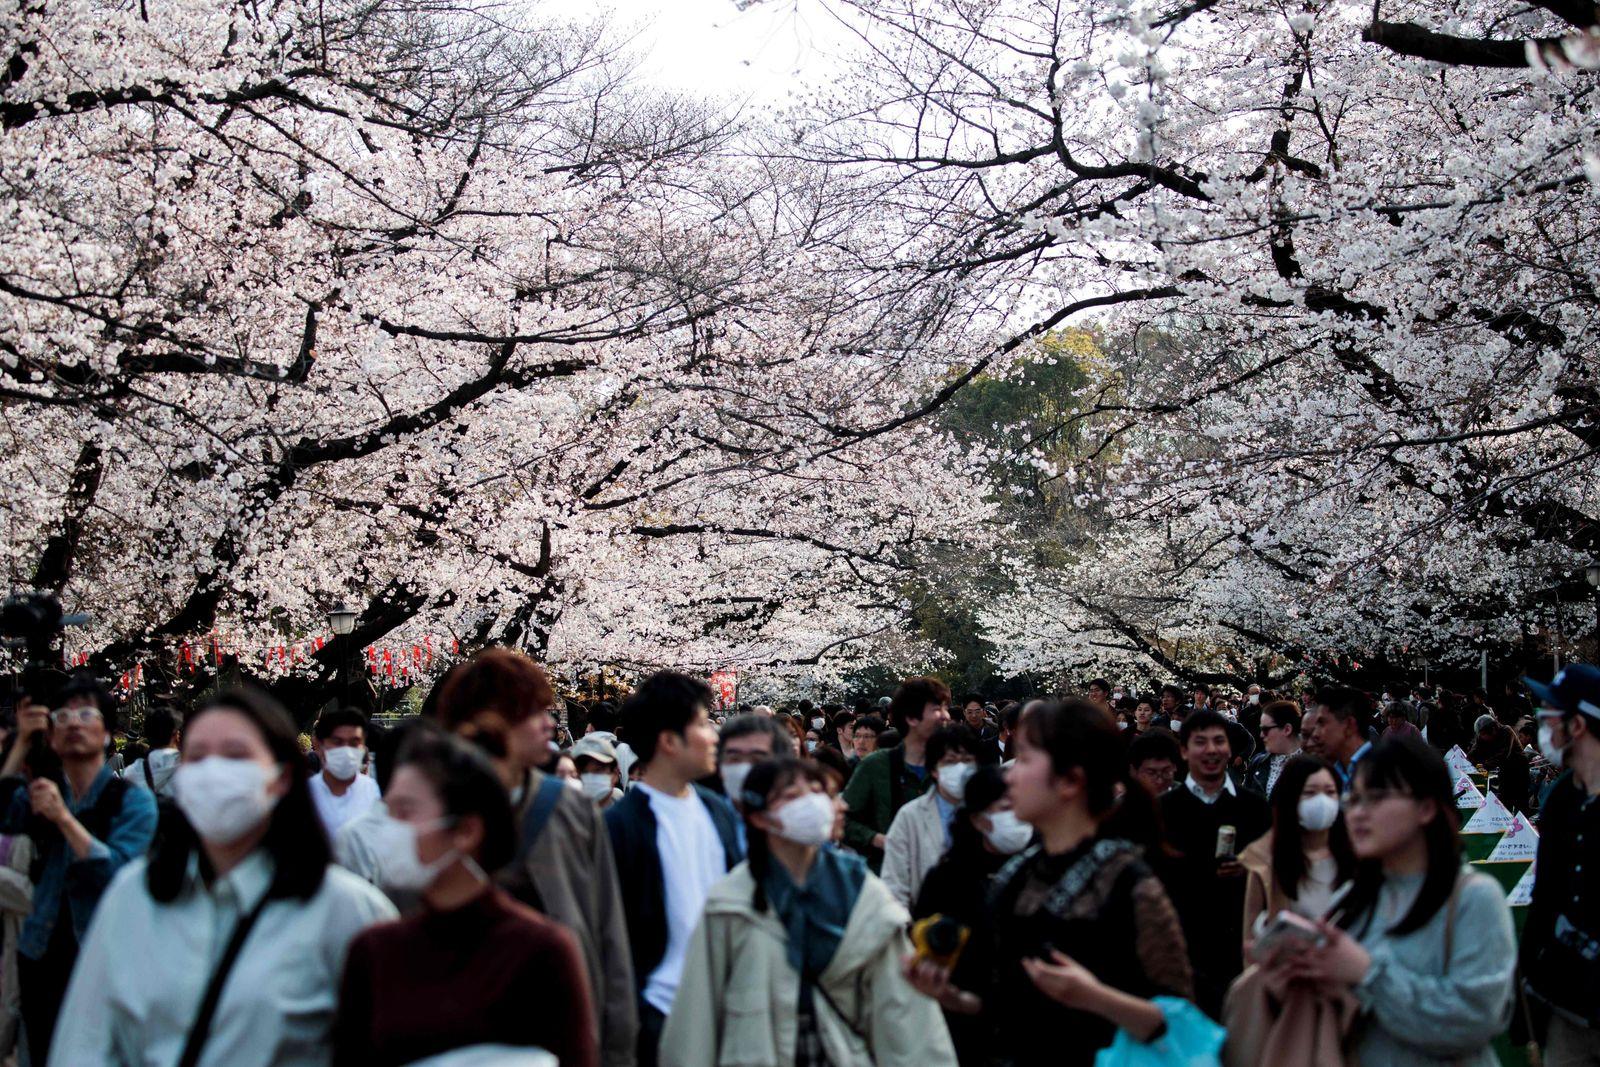 JAPAN-WEATHER-SPRING-LIFESTYLE